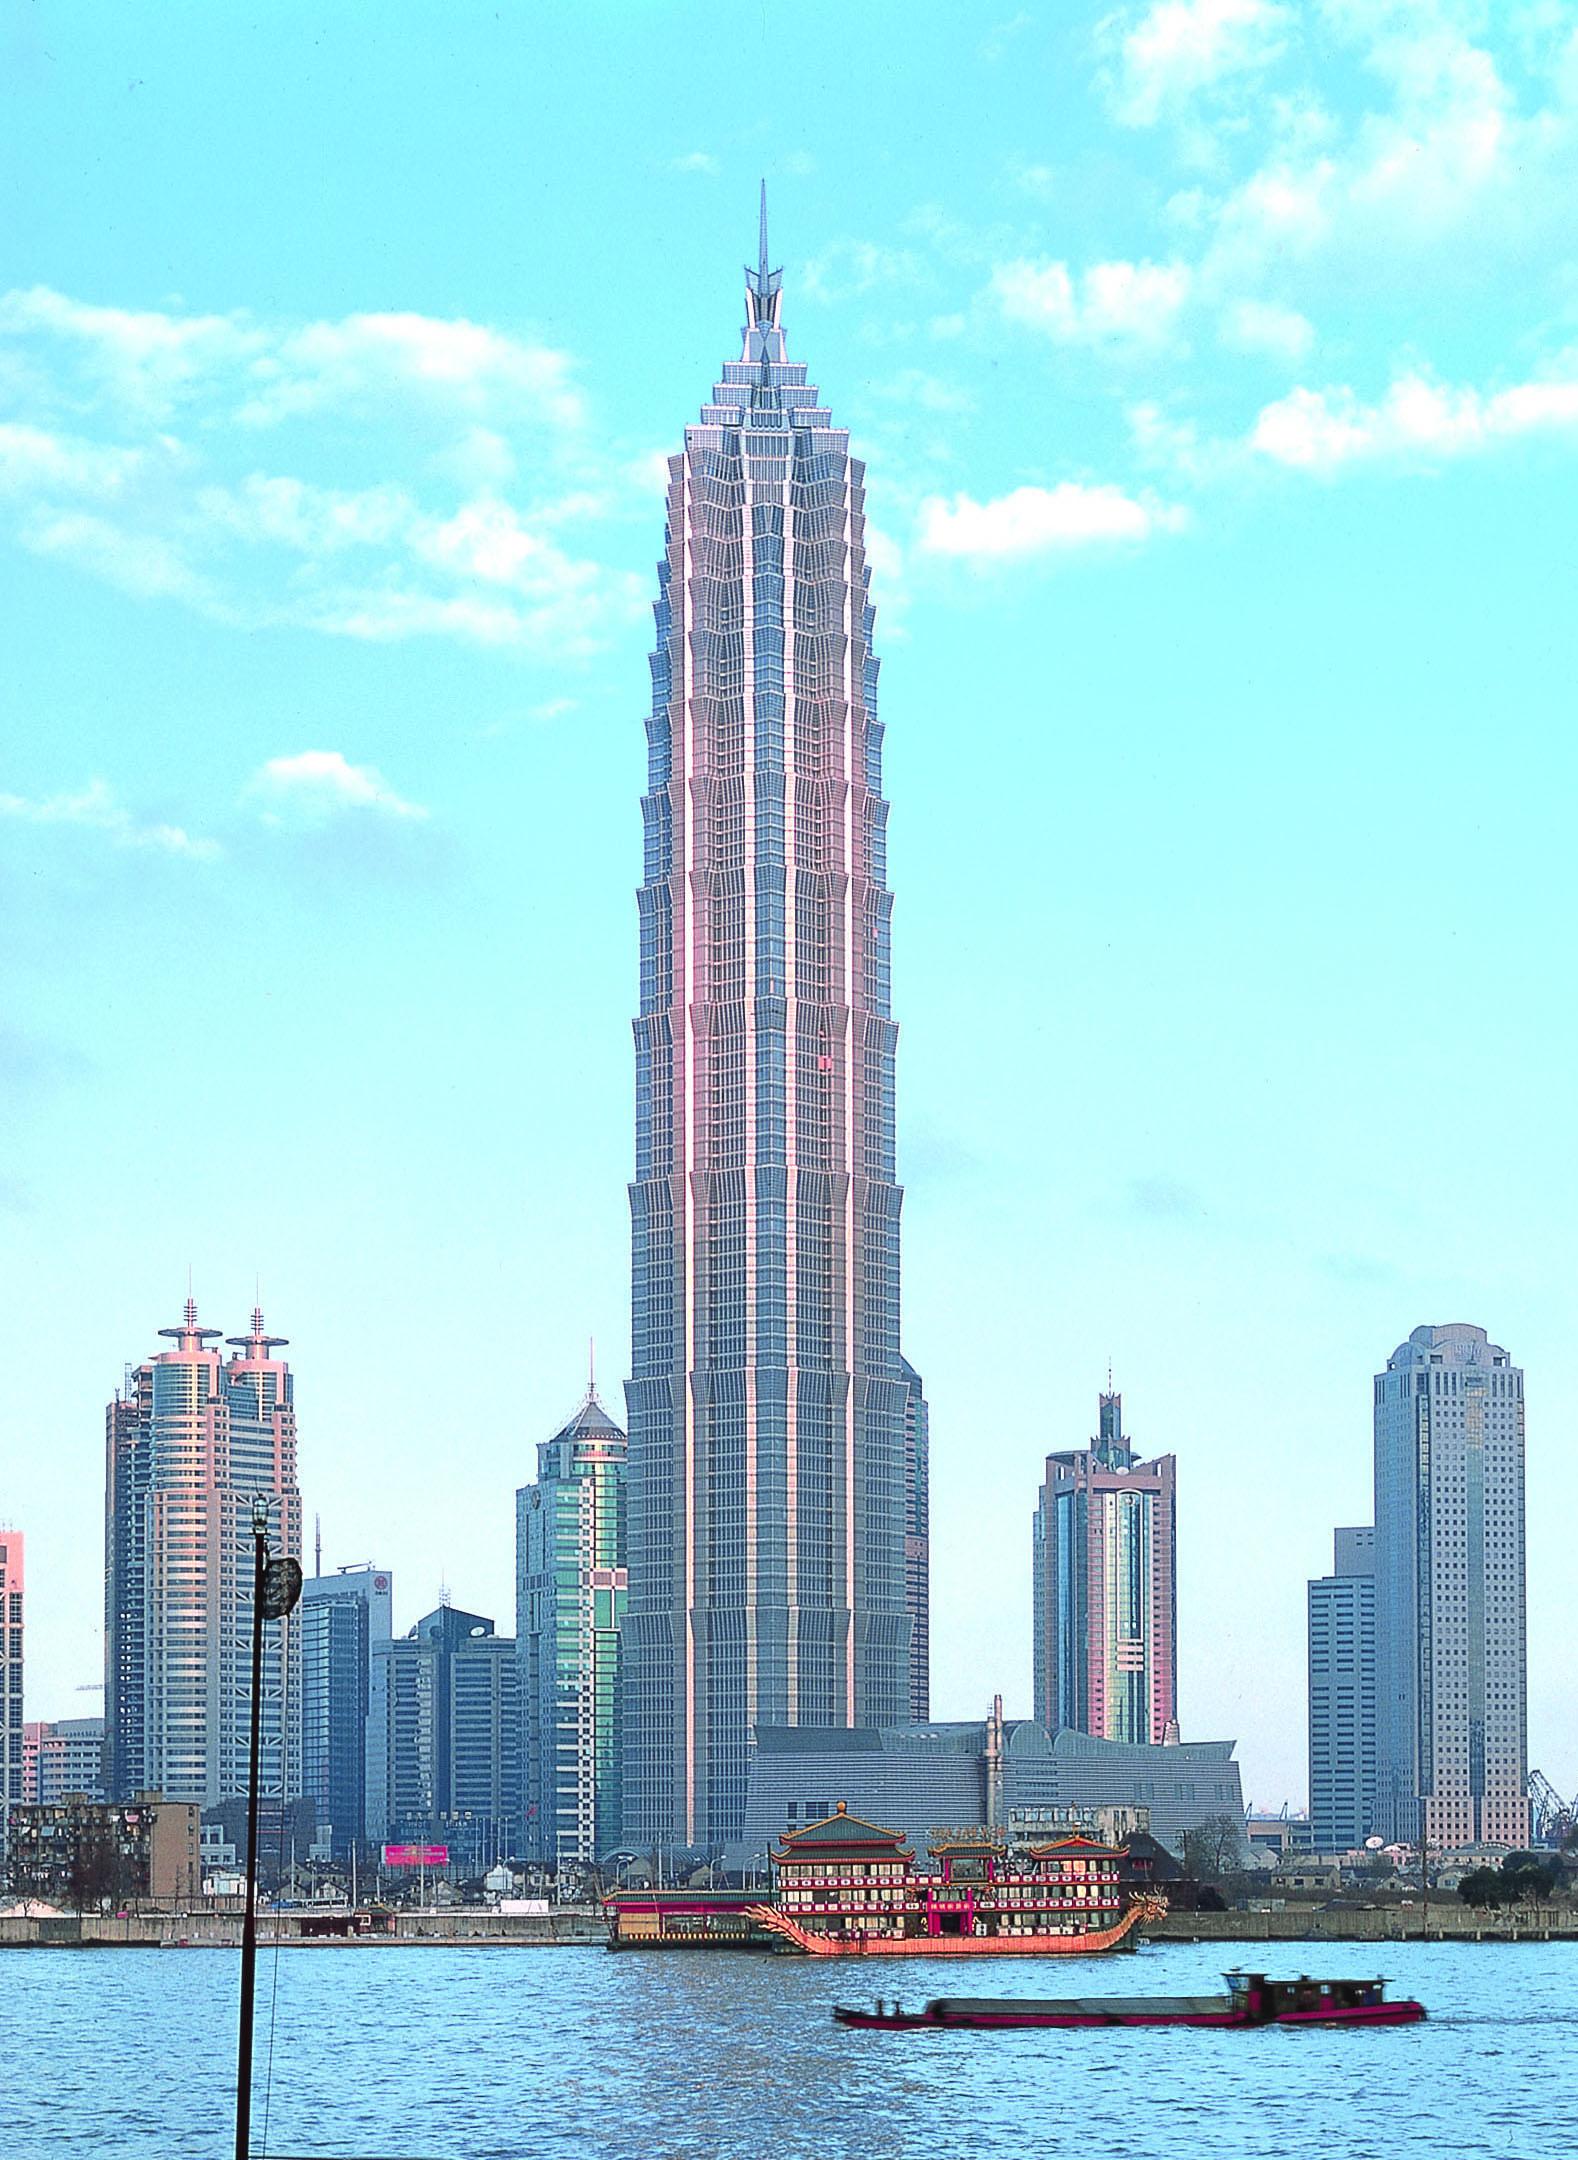 Jin Mao Tower 2